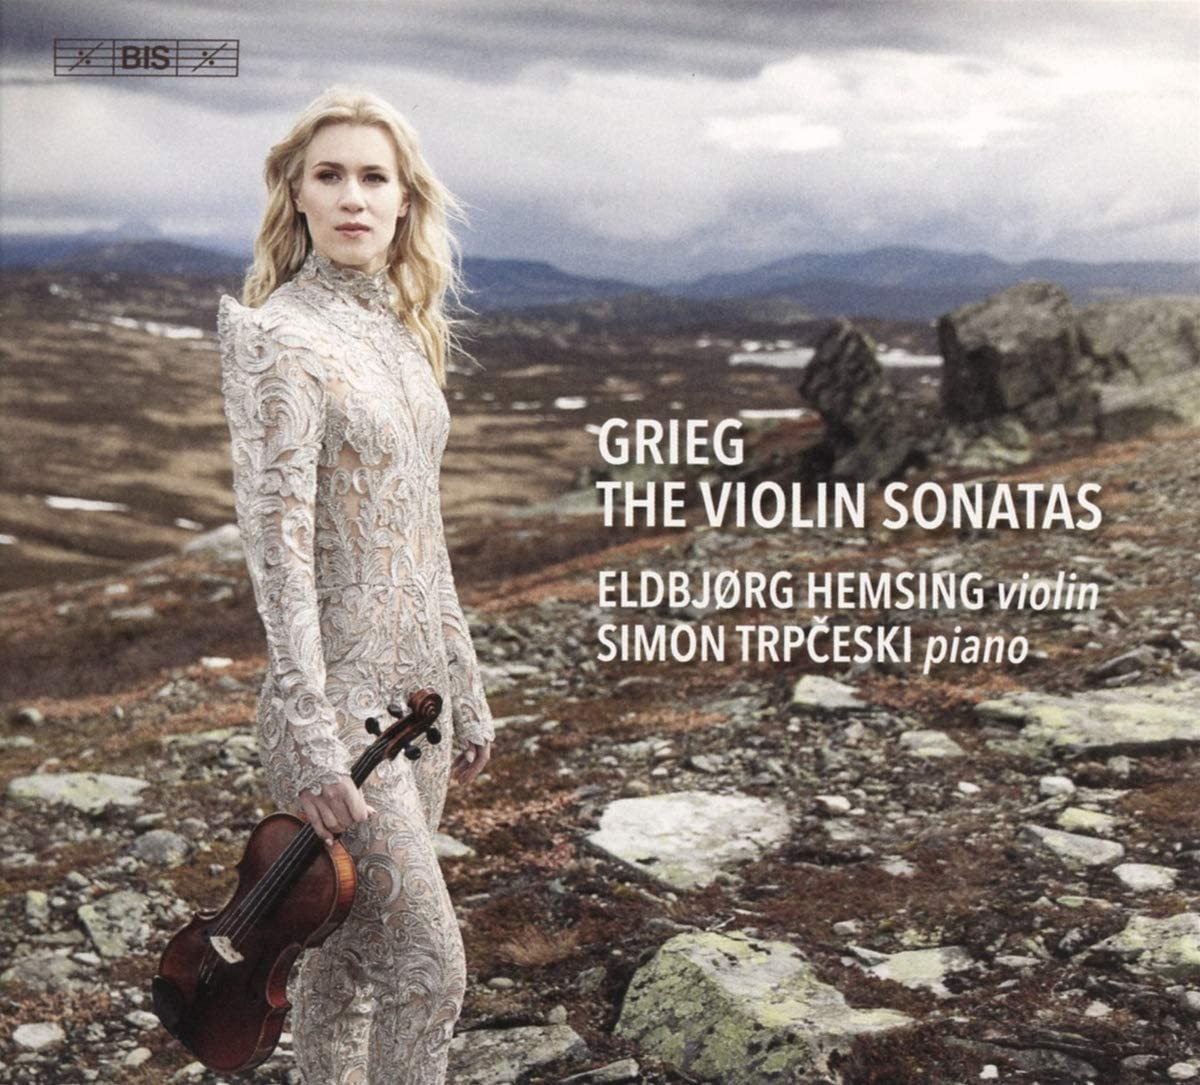 Review of GRIEG Violin Sonatas (Eldbjørg Hemsing)